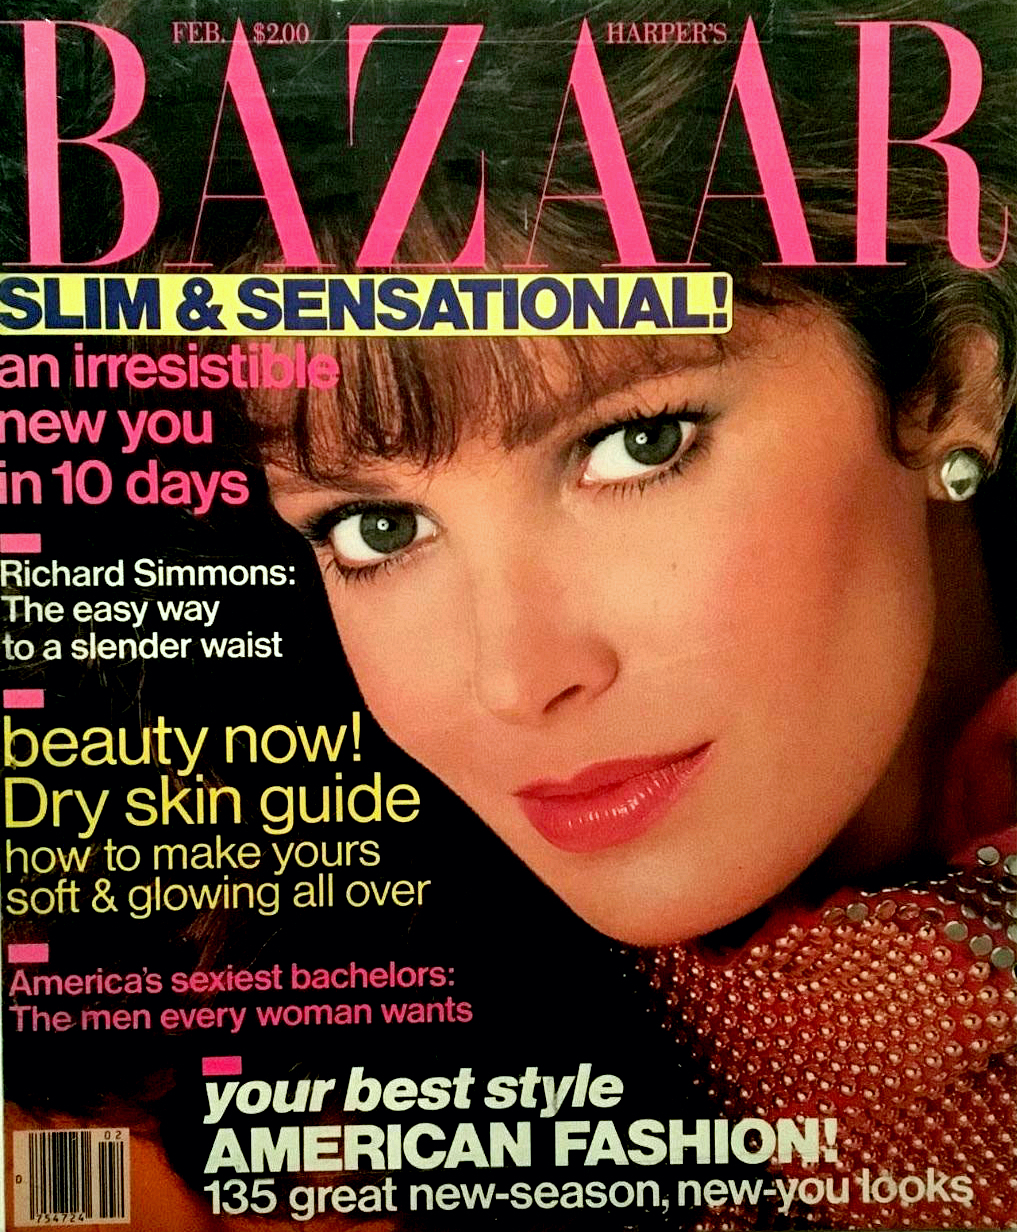 Jaclyn on the cover of Harper's Bazaar magazine, 1983.